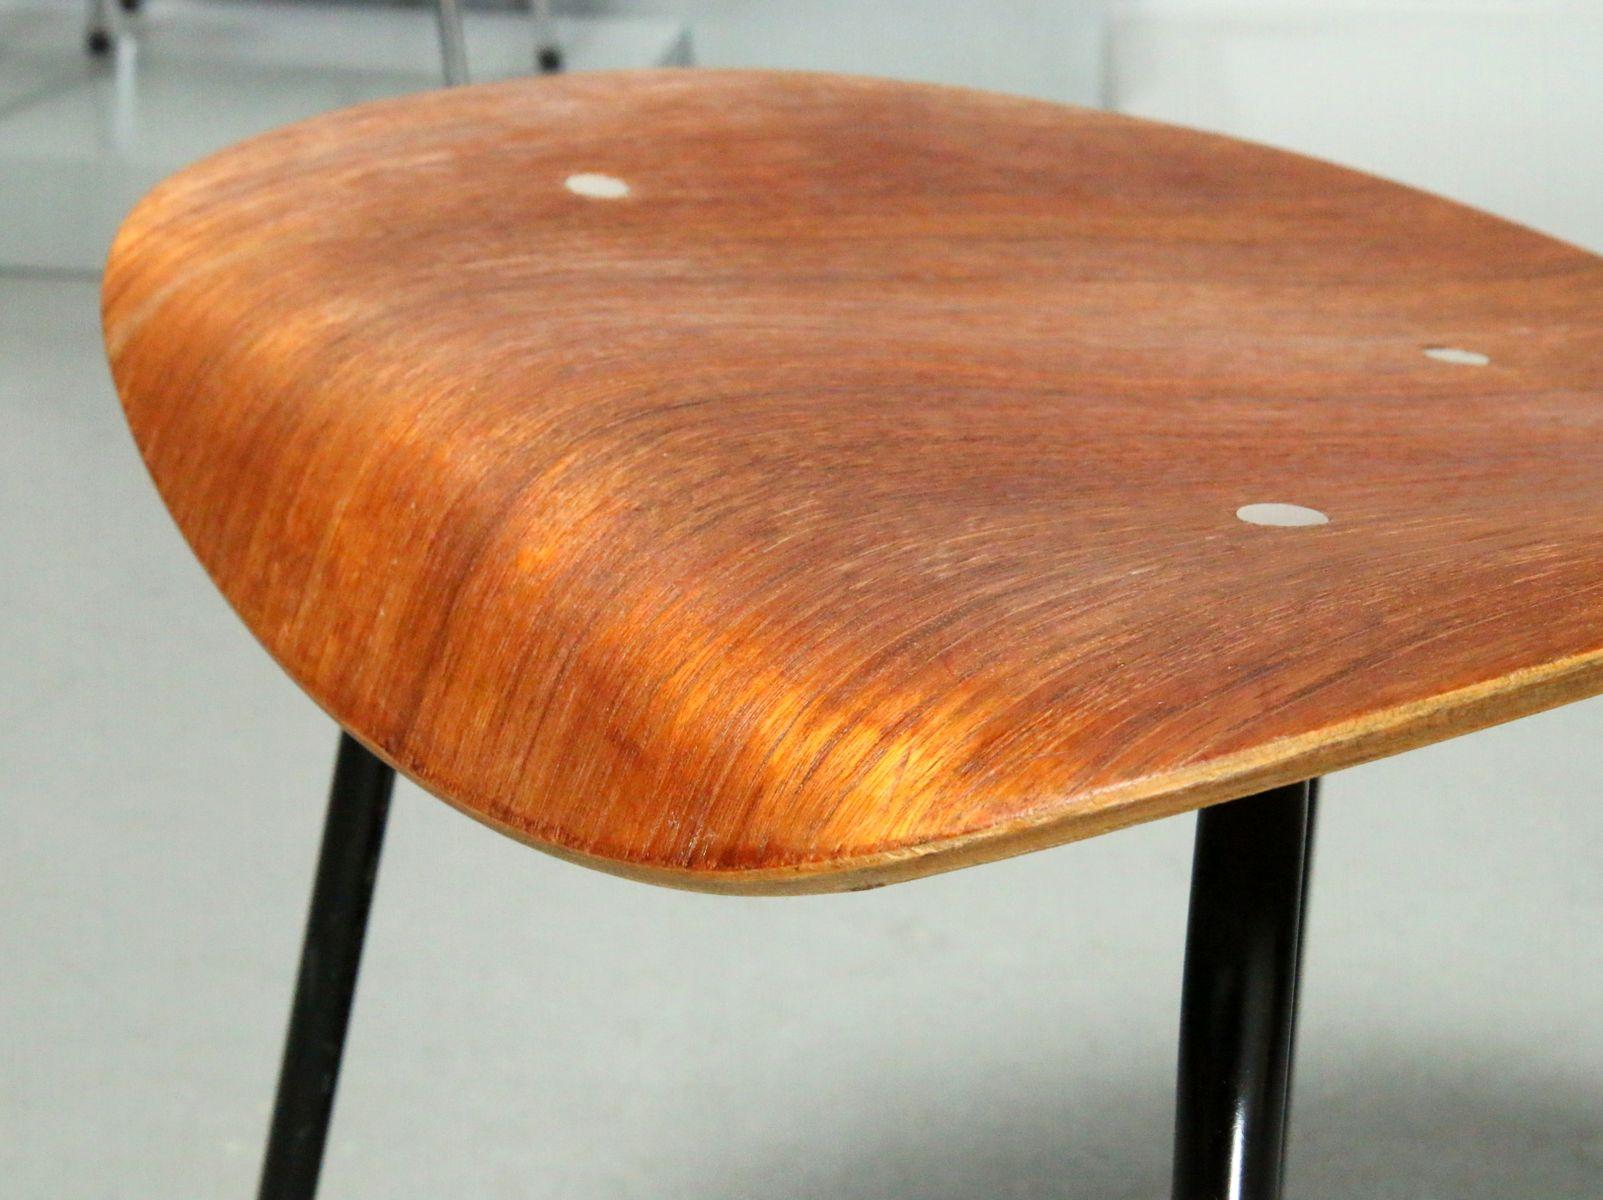 Se 68 Teak Chair By Egon Eiermann For Wilde Spieth 1960s For Sale